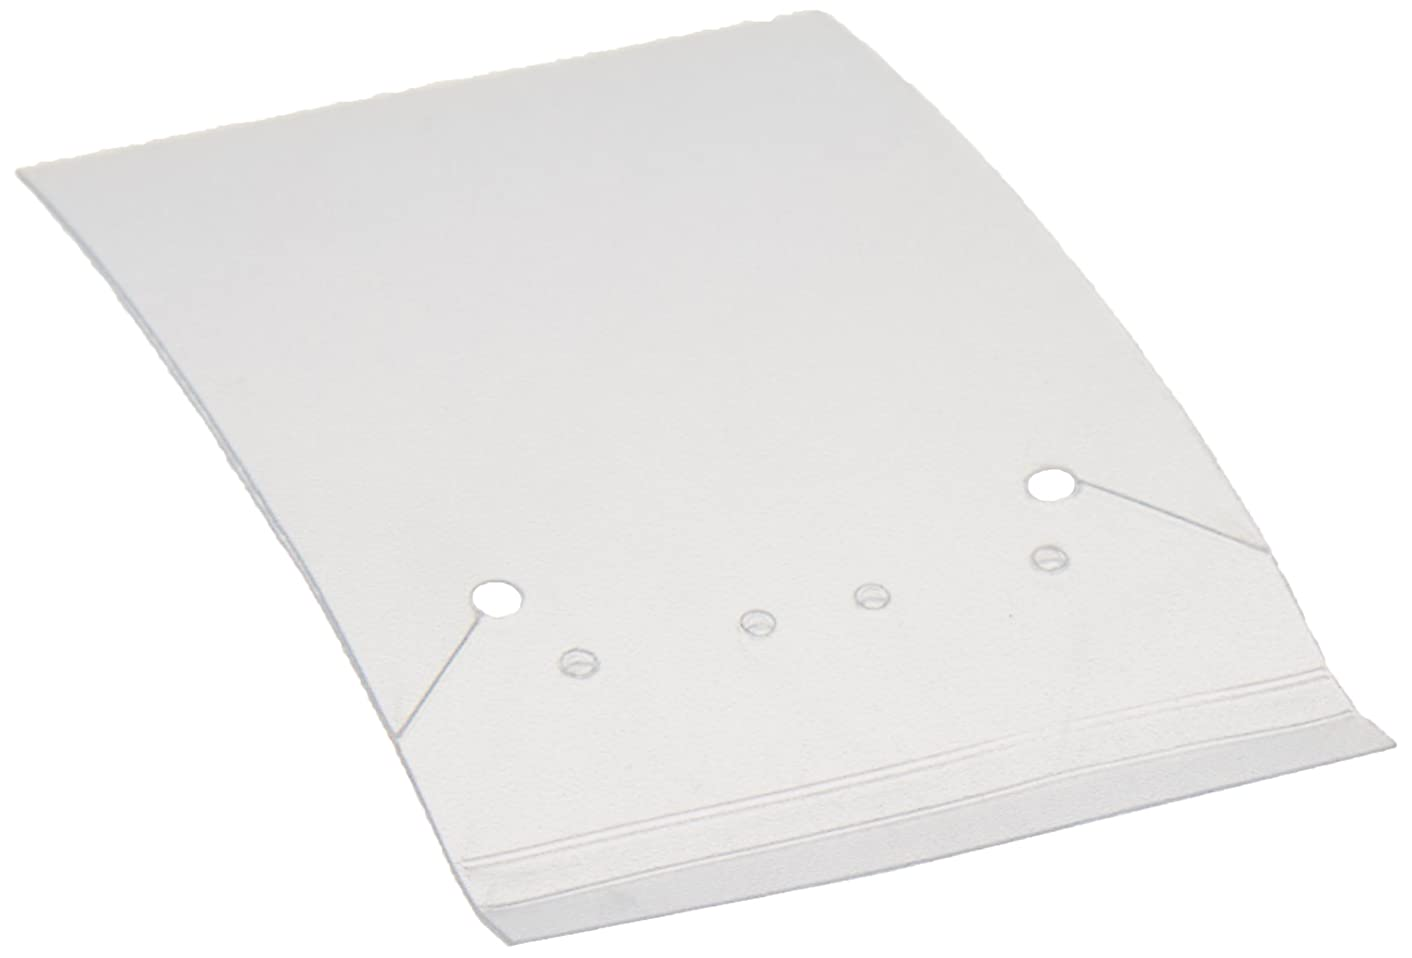 Darice 84-Piece Plastic Jewelry Card, 3/18  by 2-1/6-Inch, White